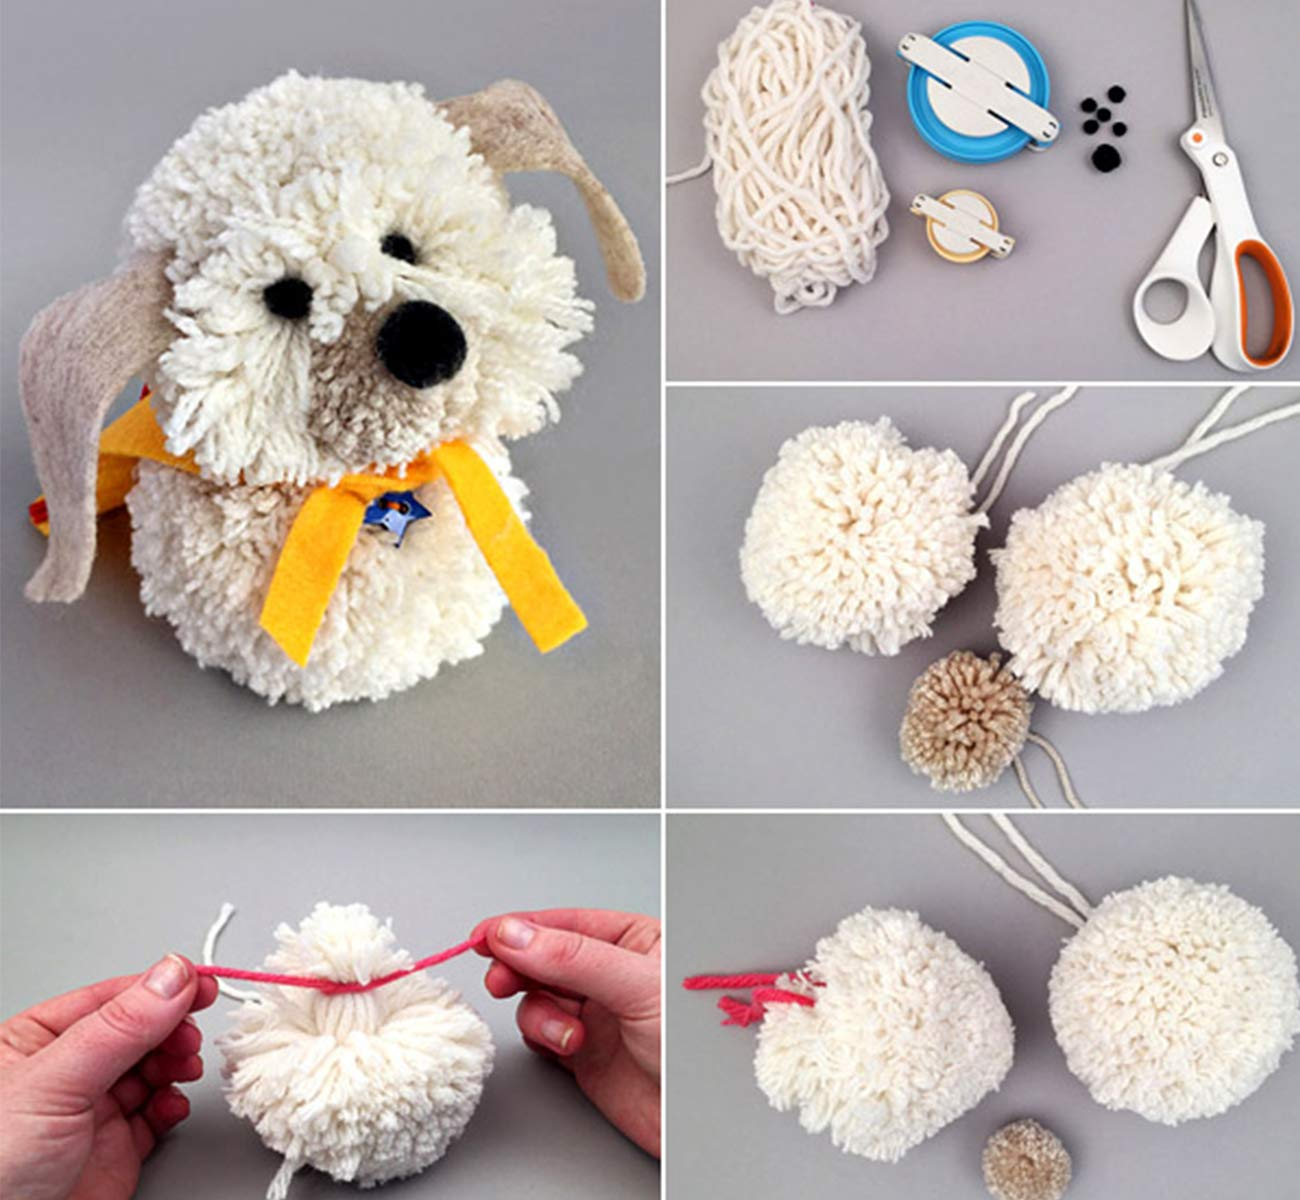 knitting yarn for beginners